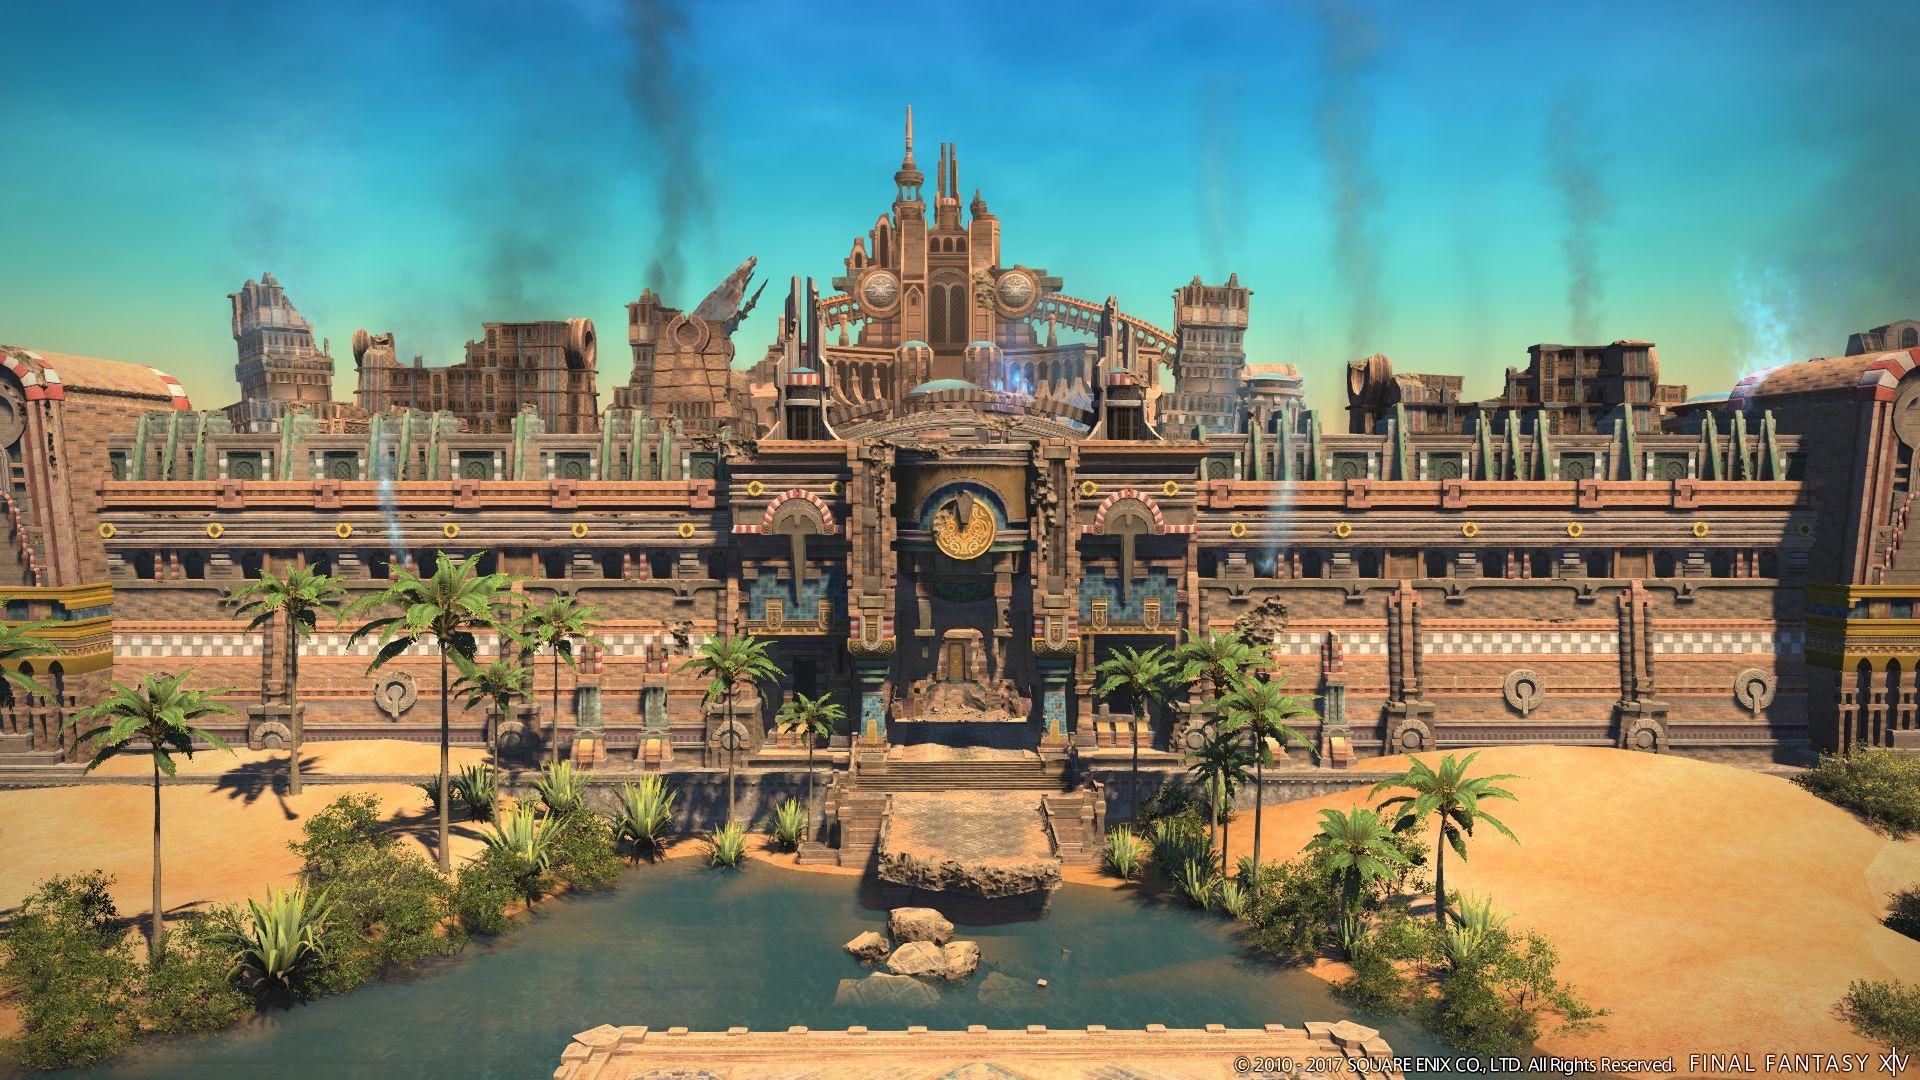 Housing in Final Fantasy XIV außer Kontrolle – 1 Milliarde Gil pro Haus?